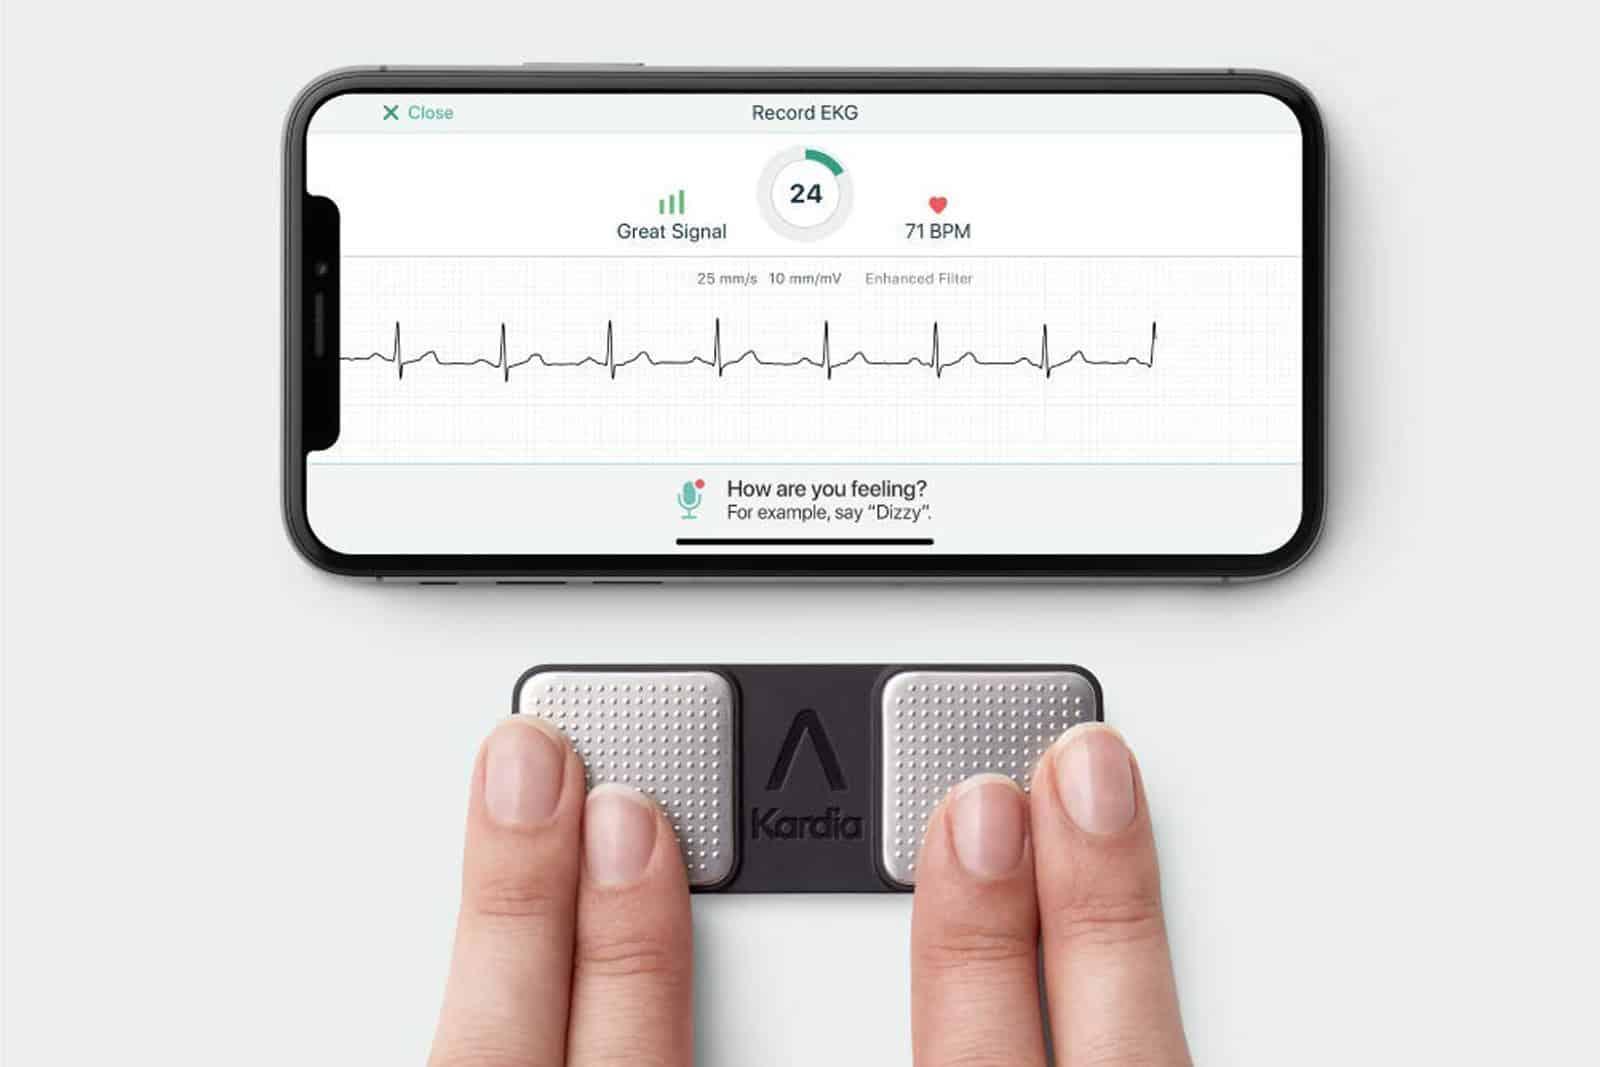 Kardia Personal EKG 2